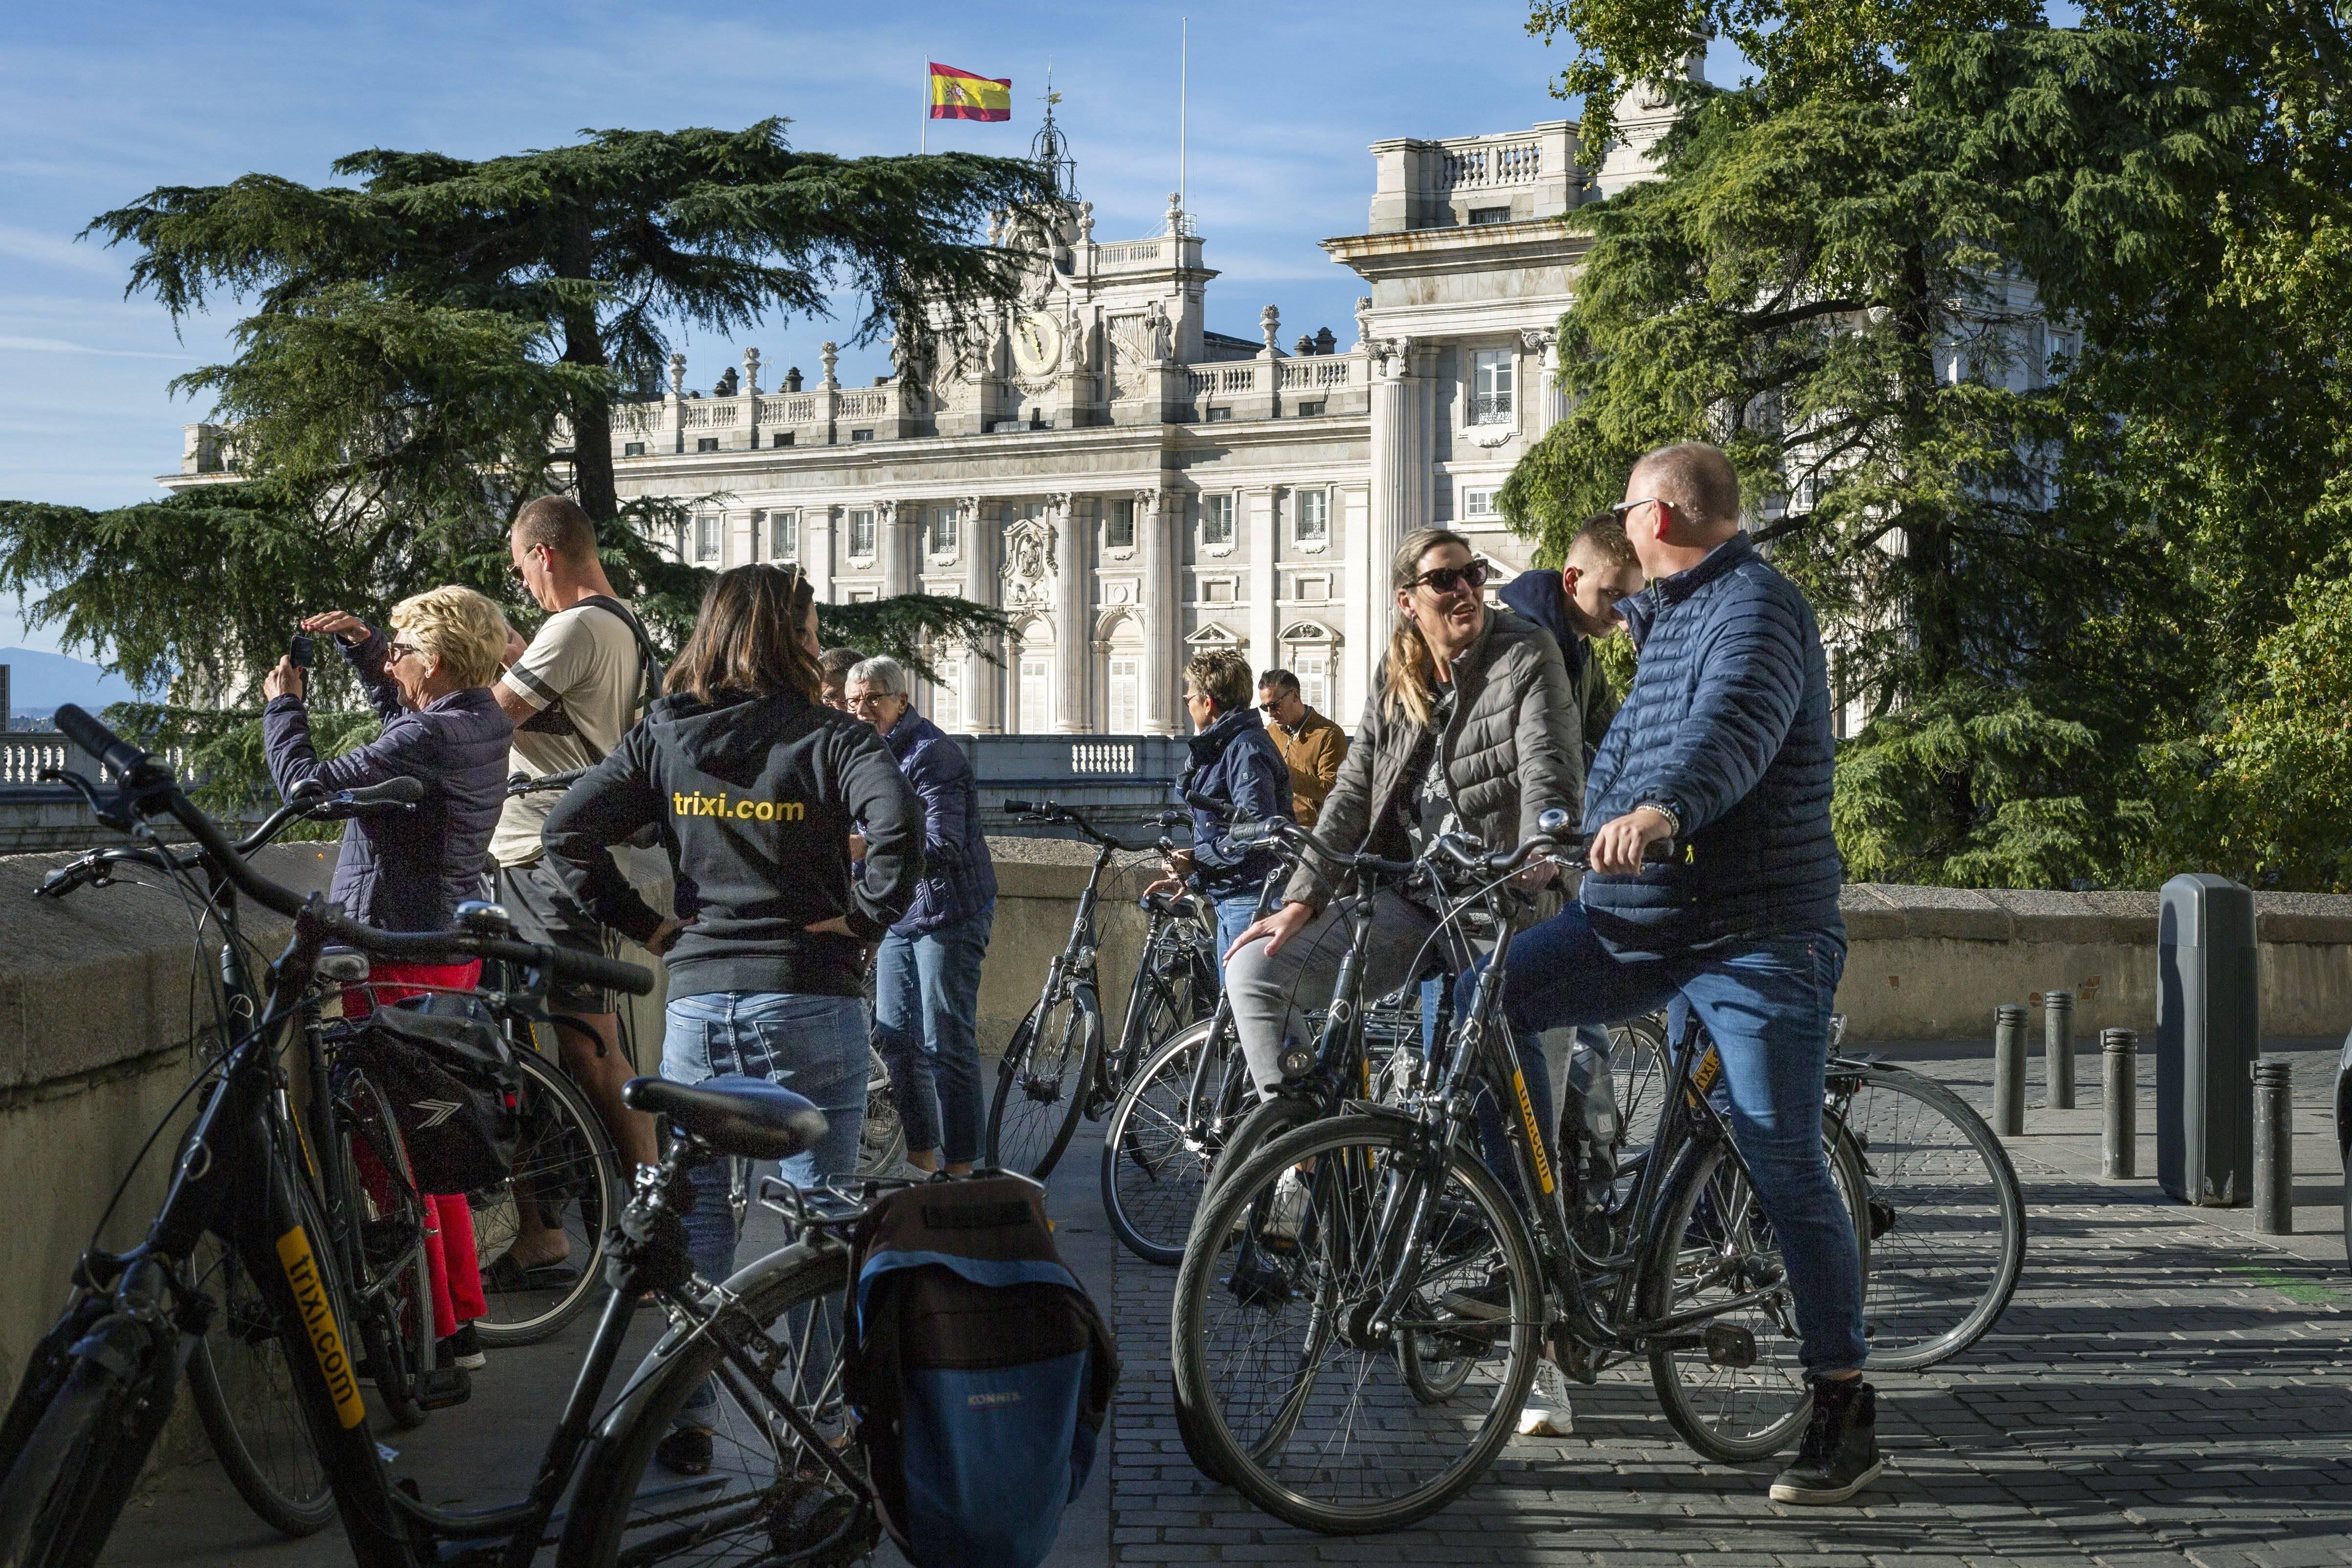 Trixi Madrid Tour de Tapas y Mercados 0020 0006